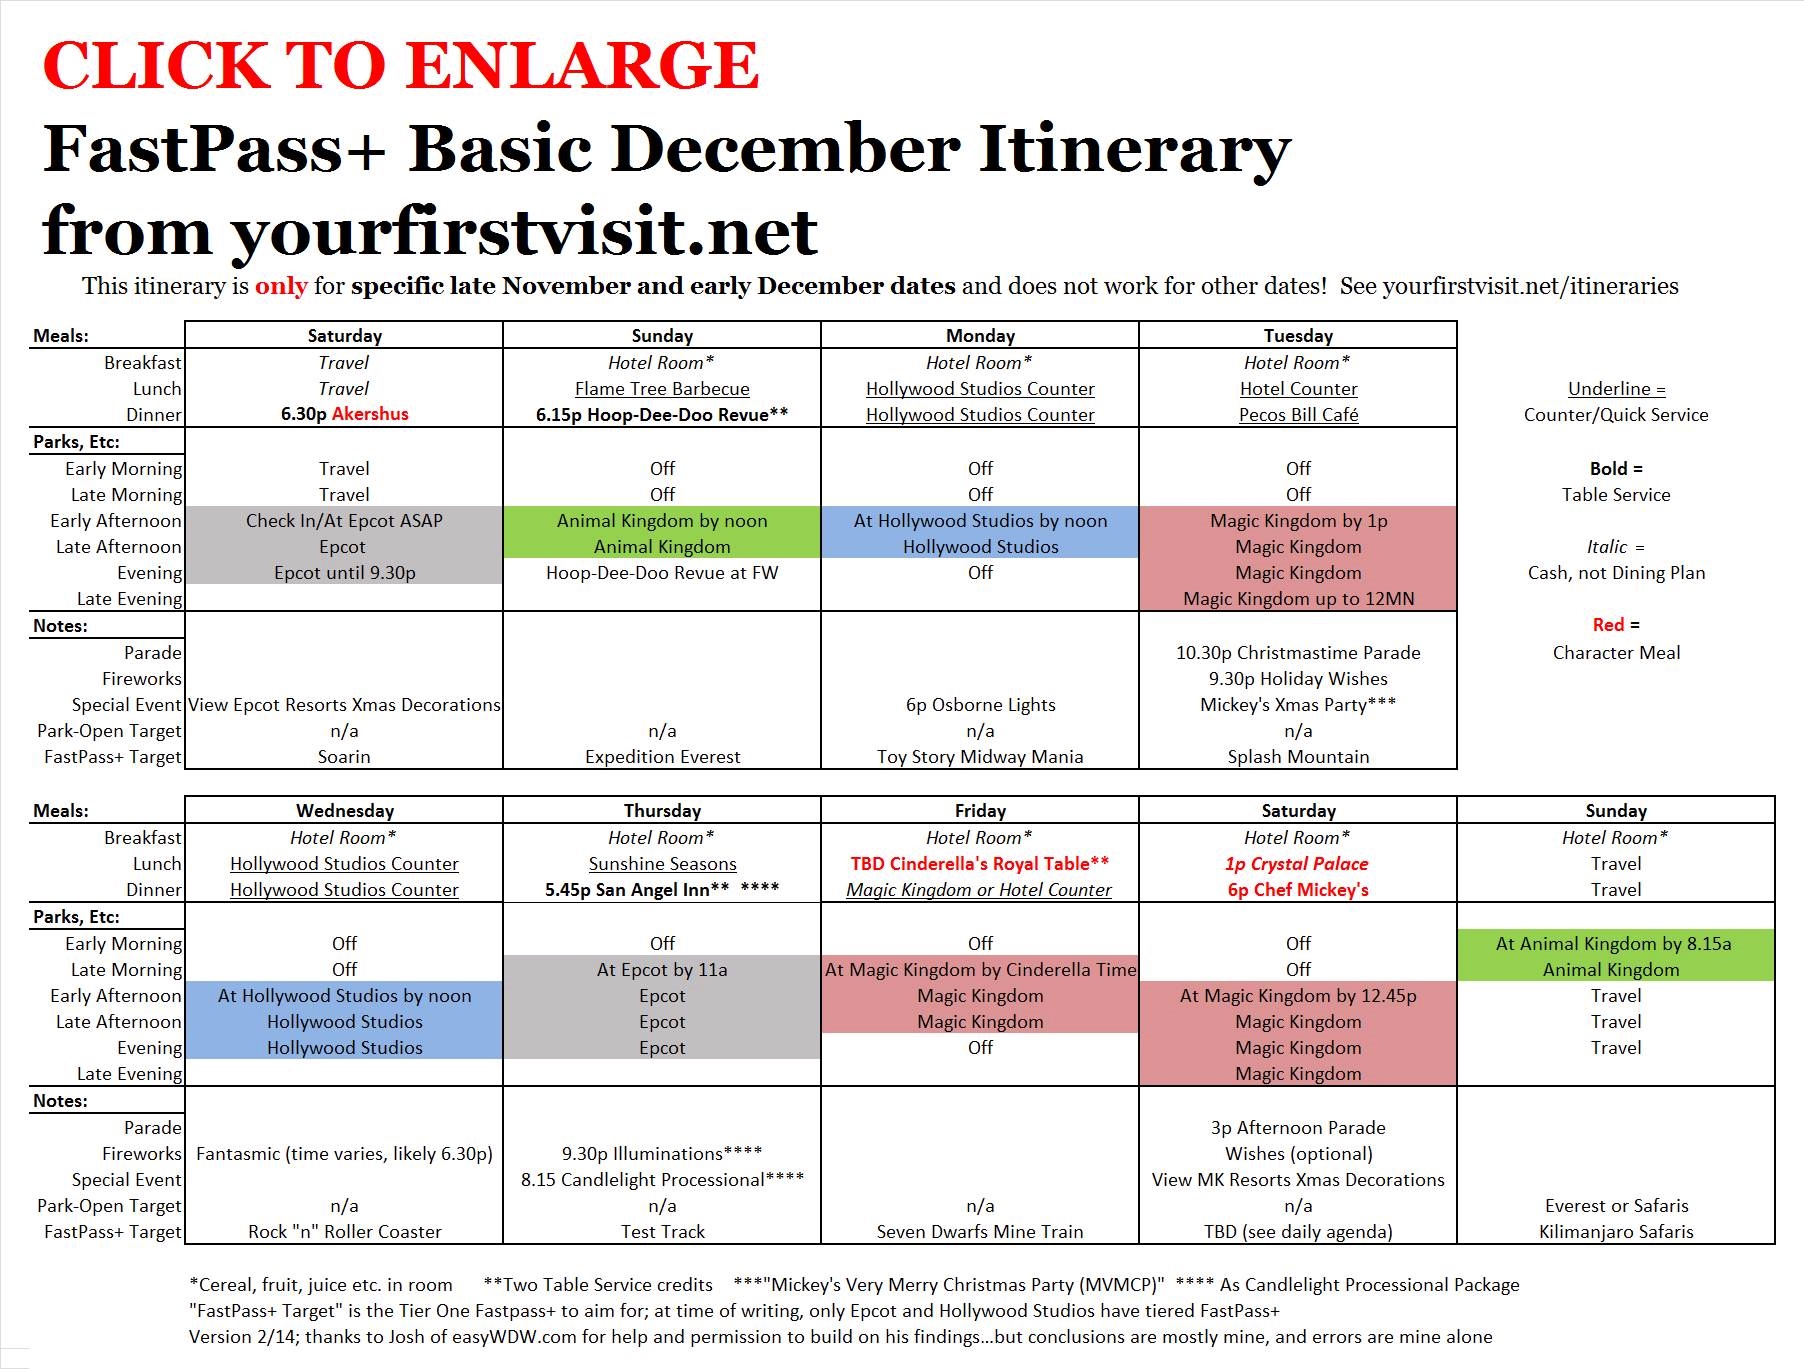 Disney World Basic December Itinerary From Yourfirstvisit